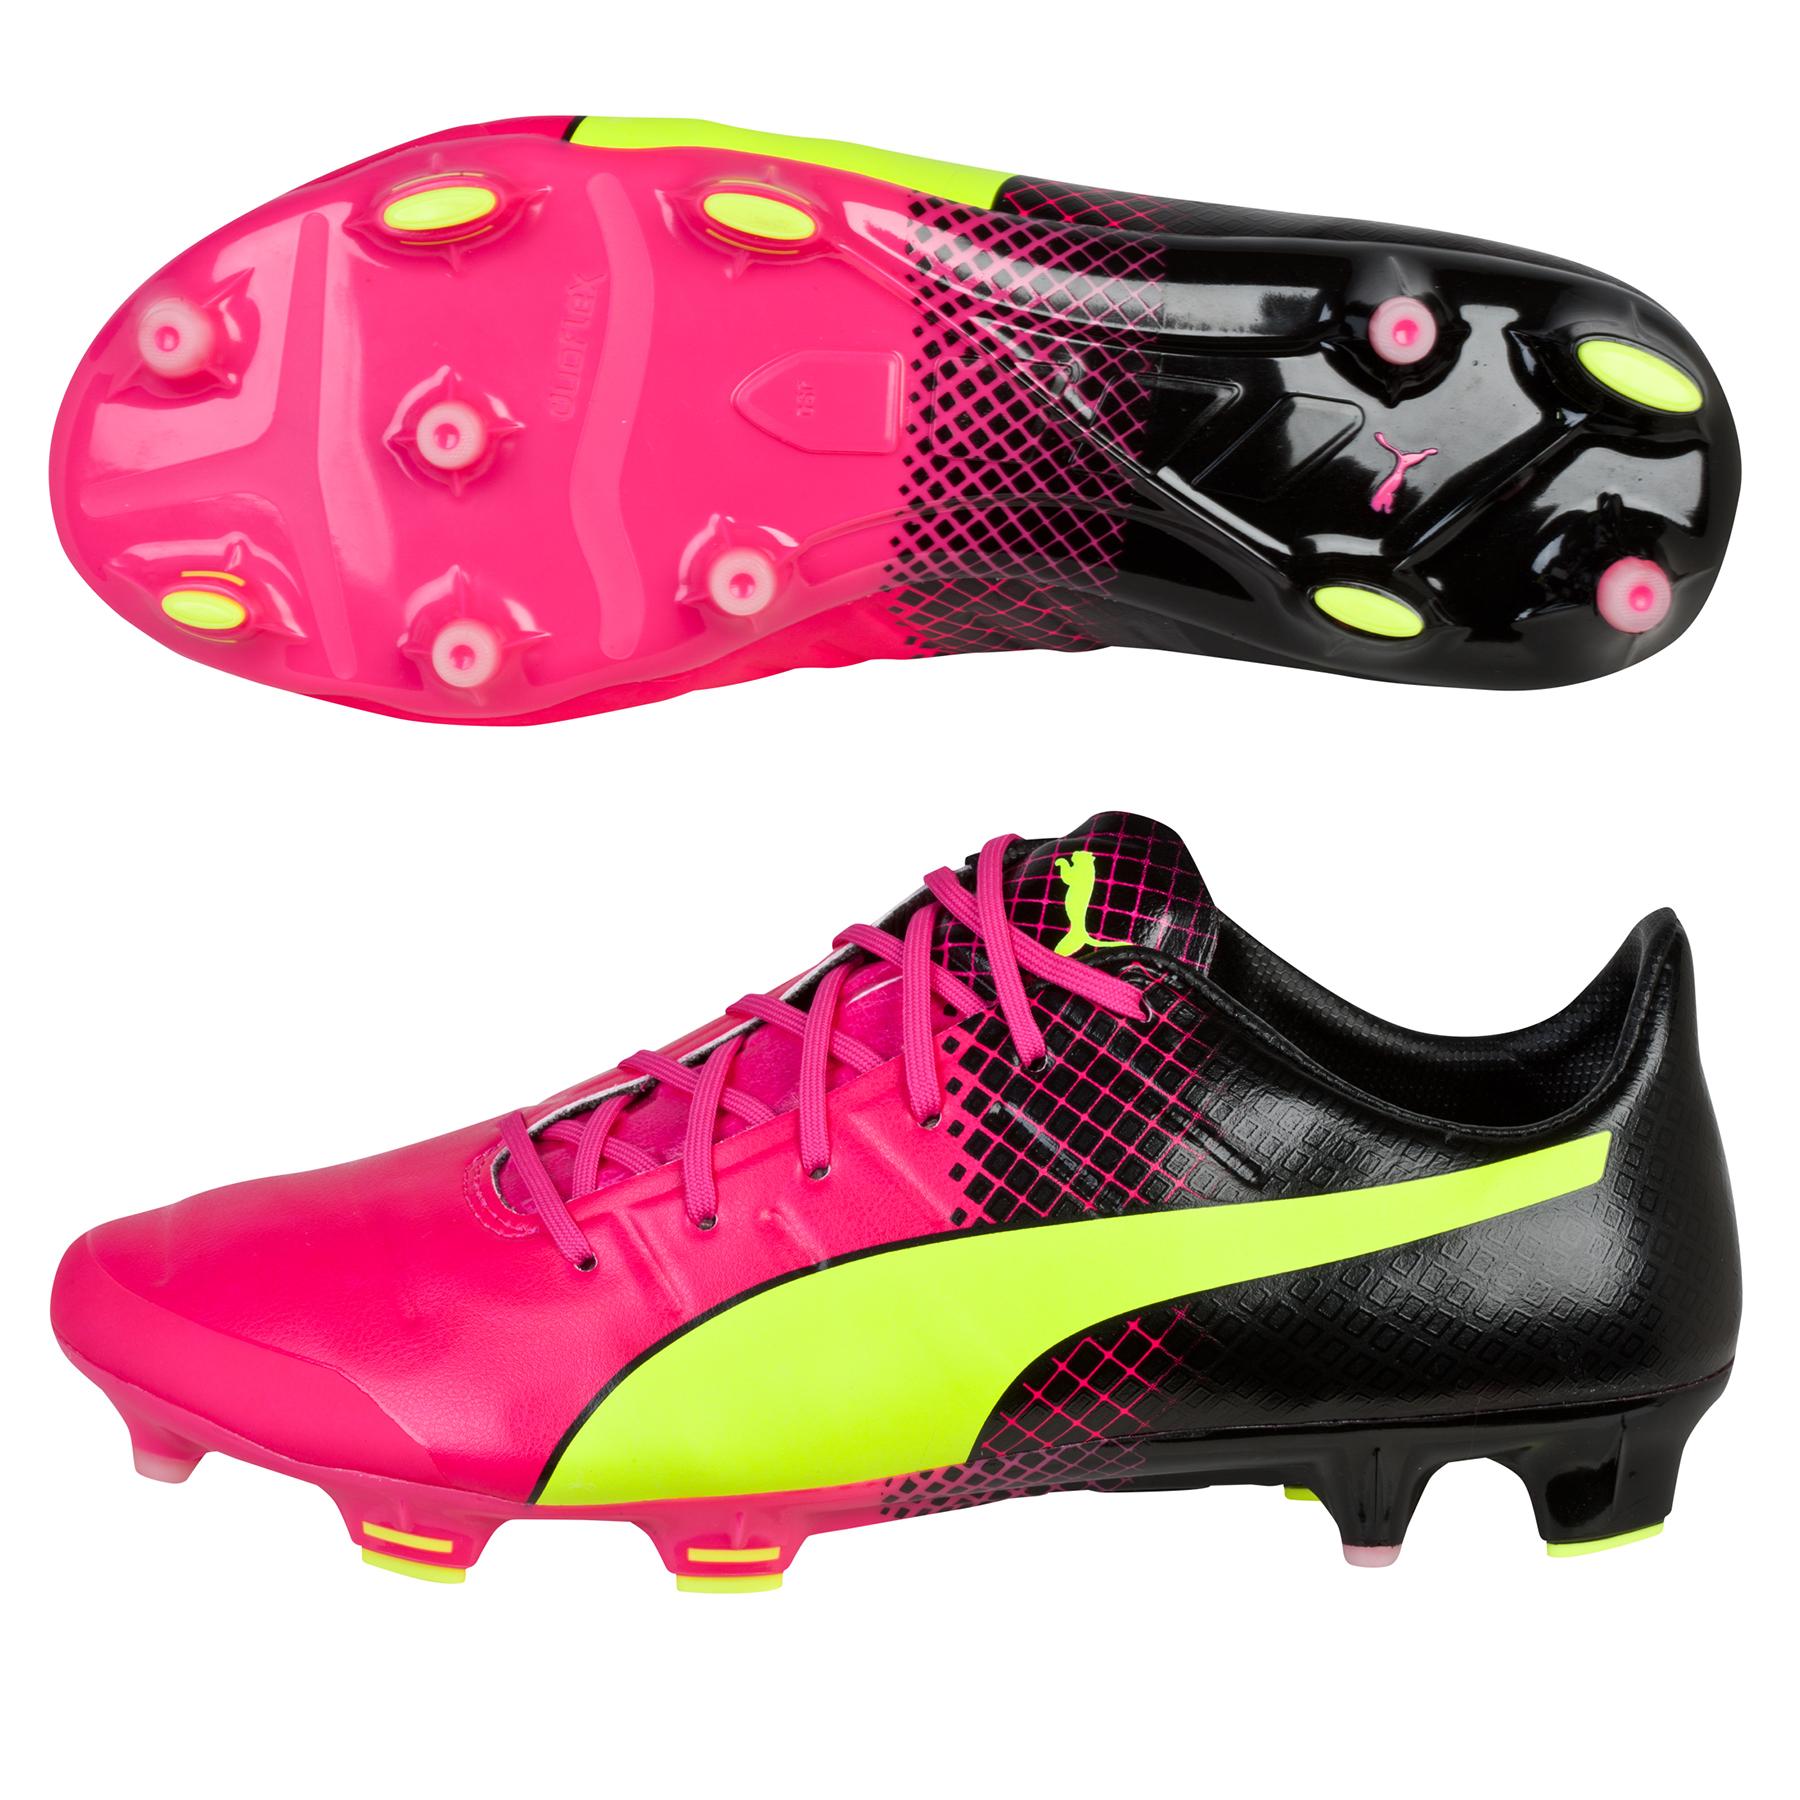 Puma evoPOWER 1.3 Tricks FG Pink